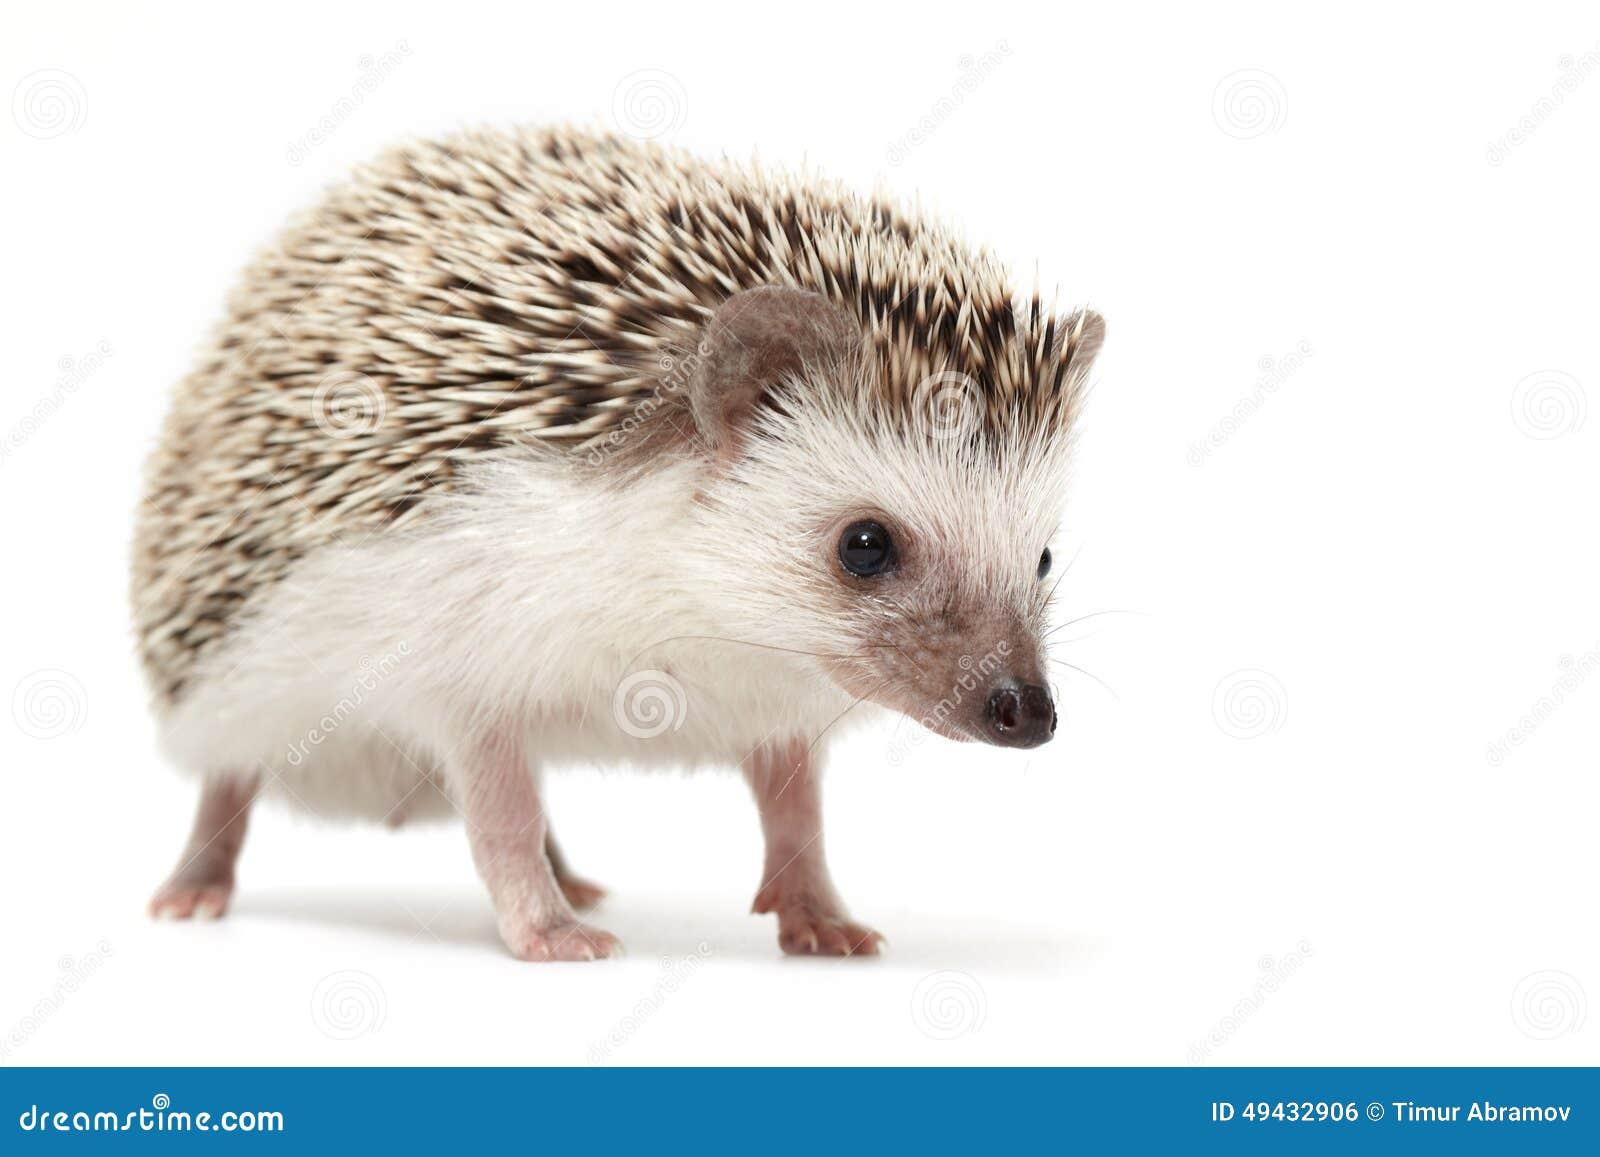 hedgehog sniffing around stock photo image 49432906. Black Bedroom Furniture Sets. Home Design Ideas